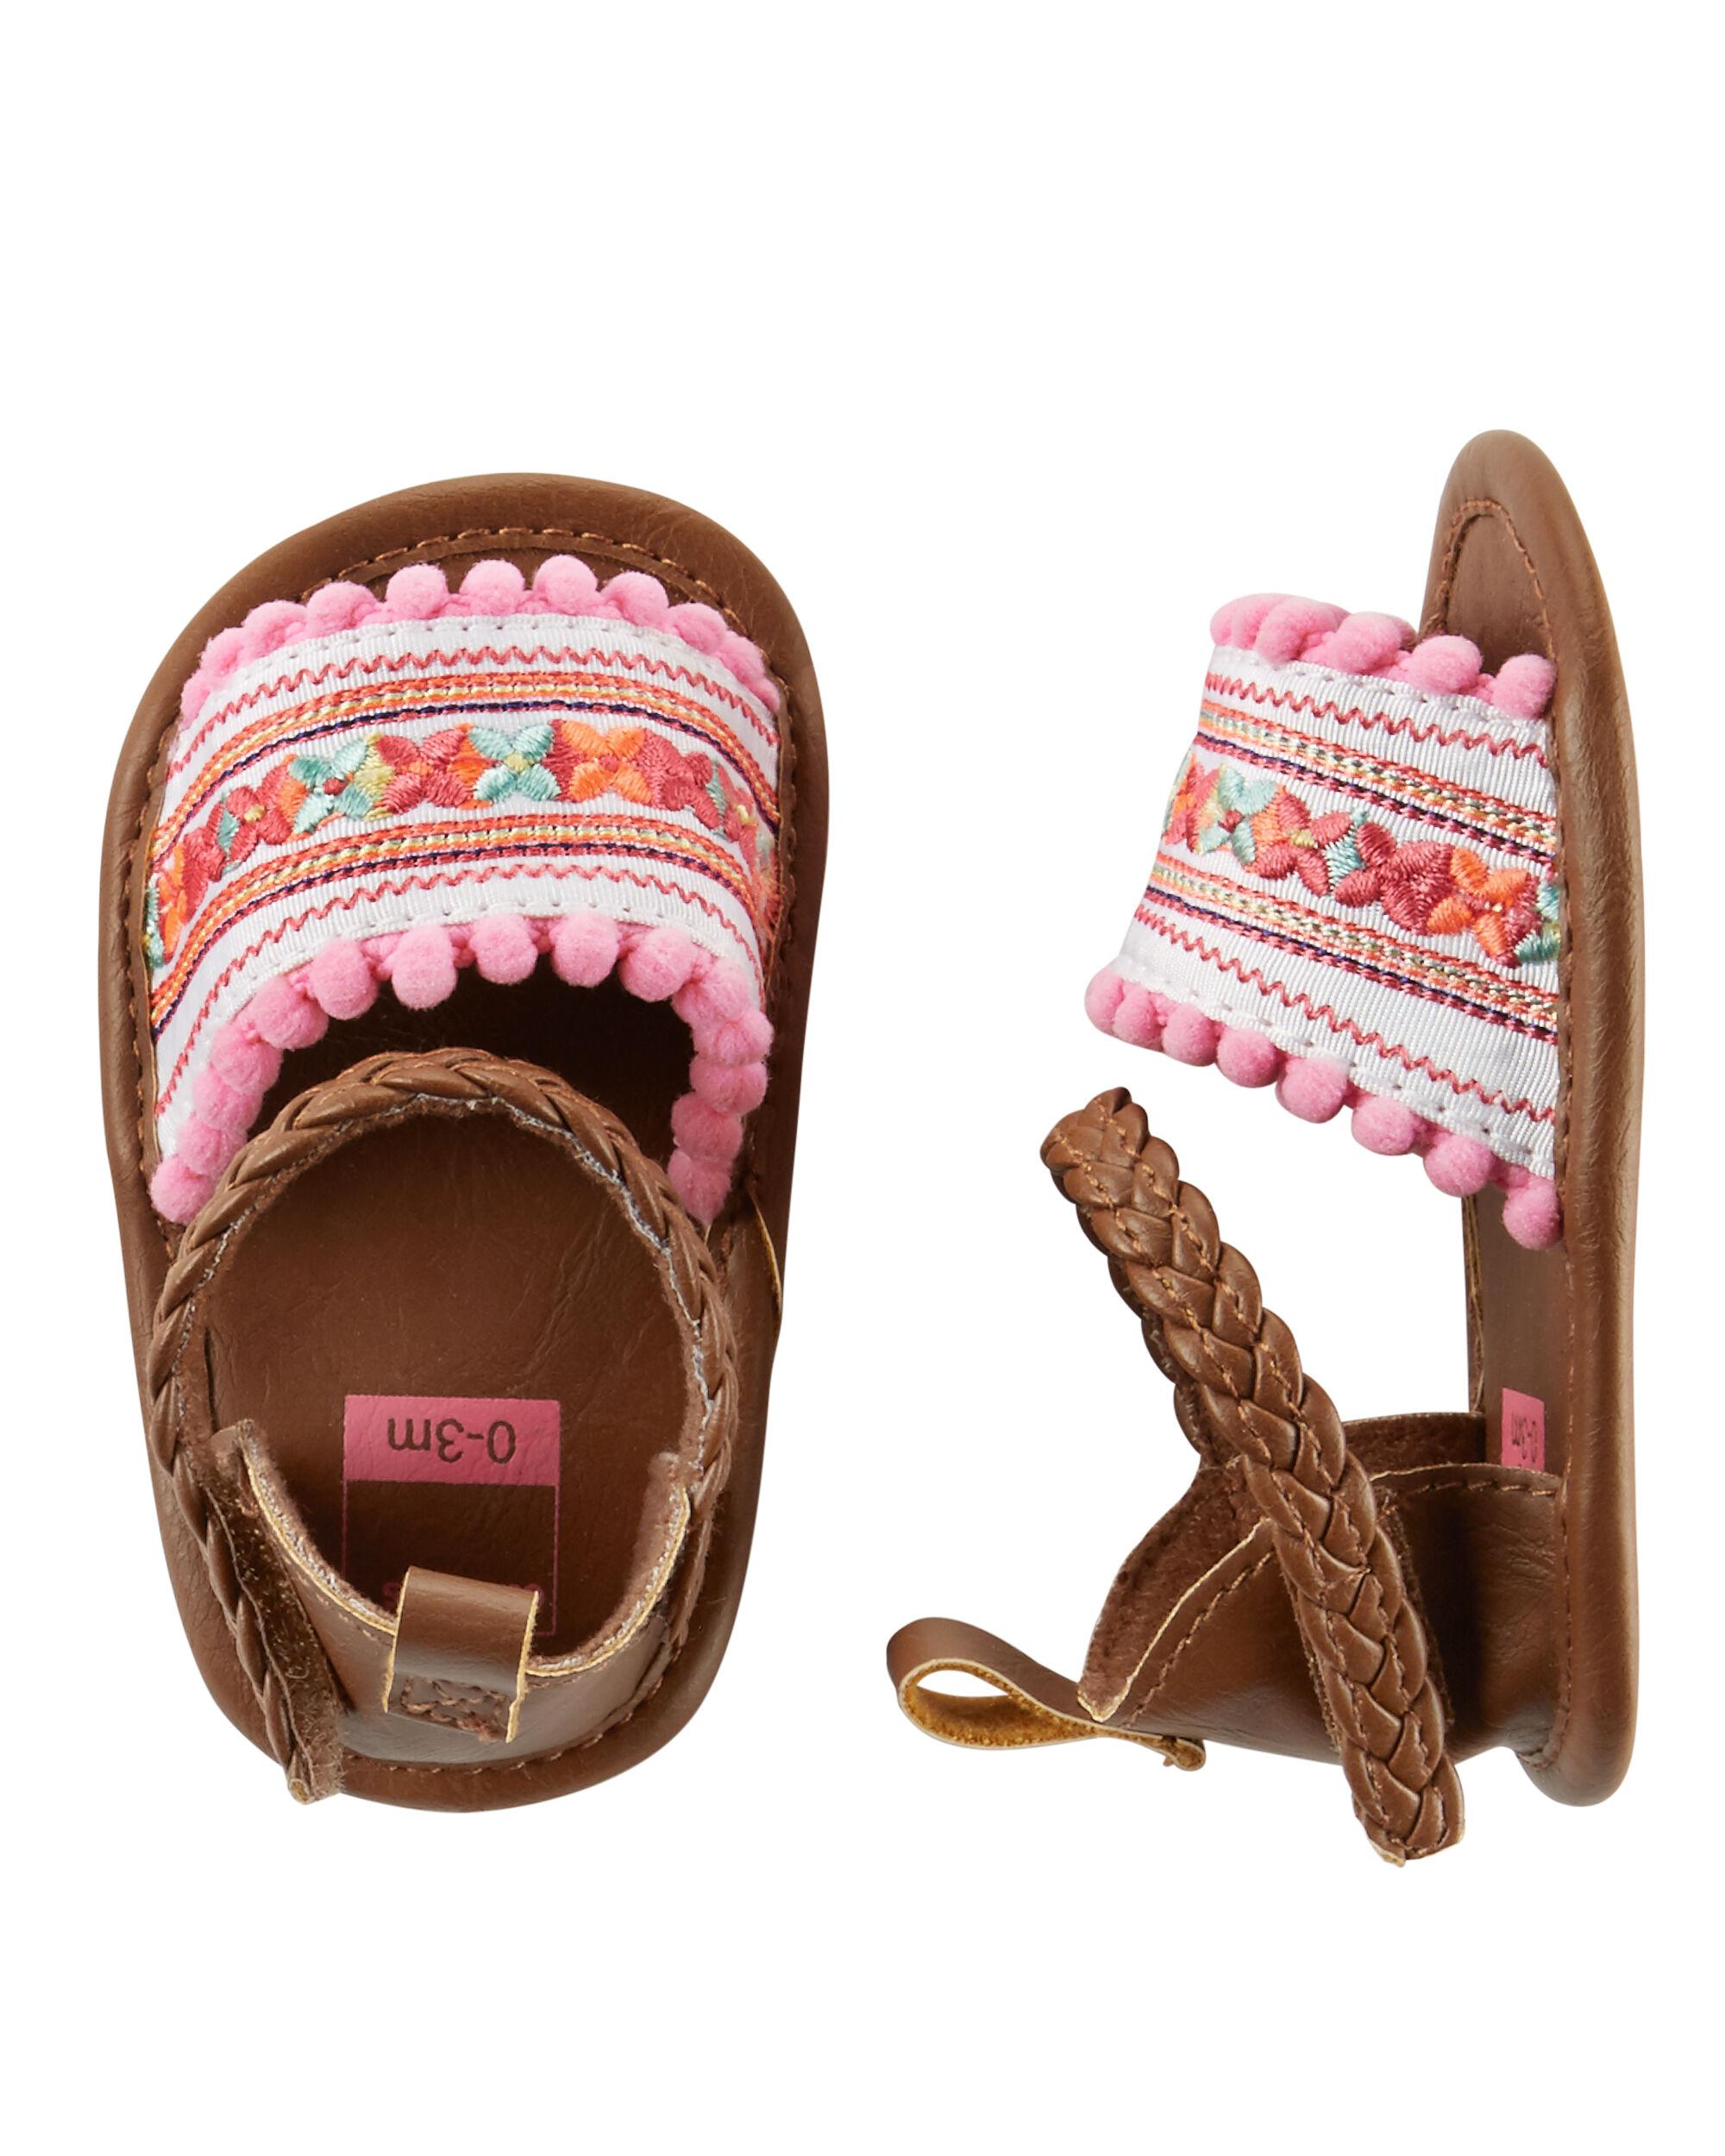 Luxury Design Of Baby Boy Crib Shoes - Cutest Baby ...